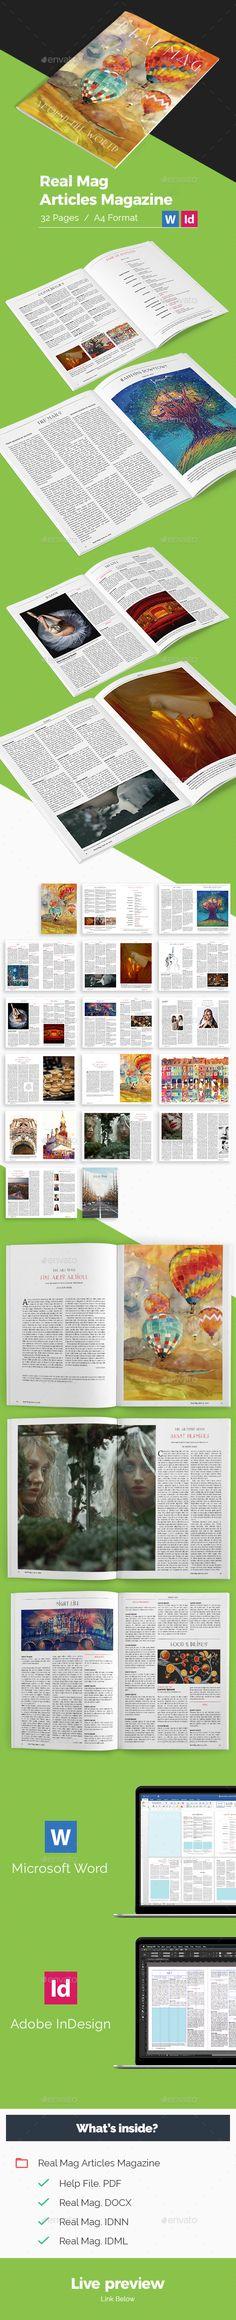 Kids magazine kids magazines print templates and template articles magazine maxwellsz